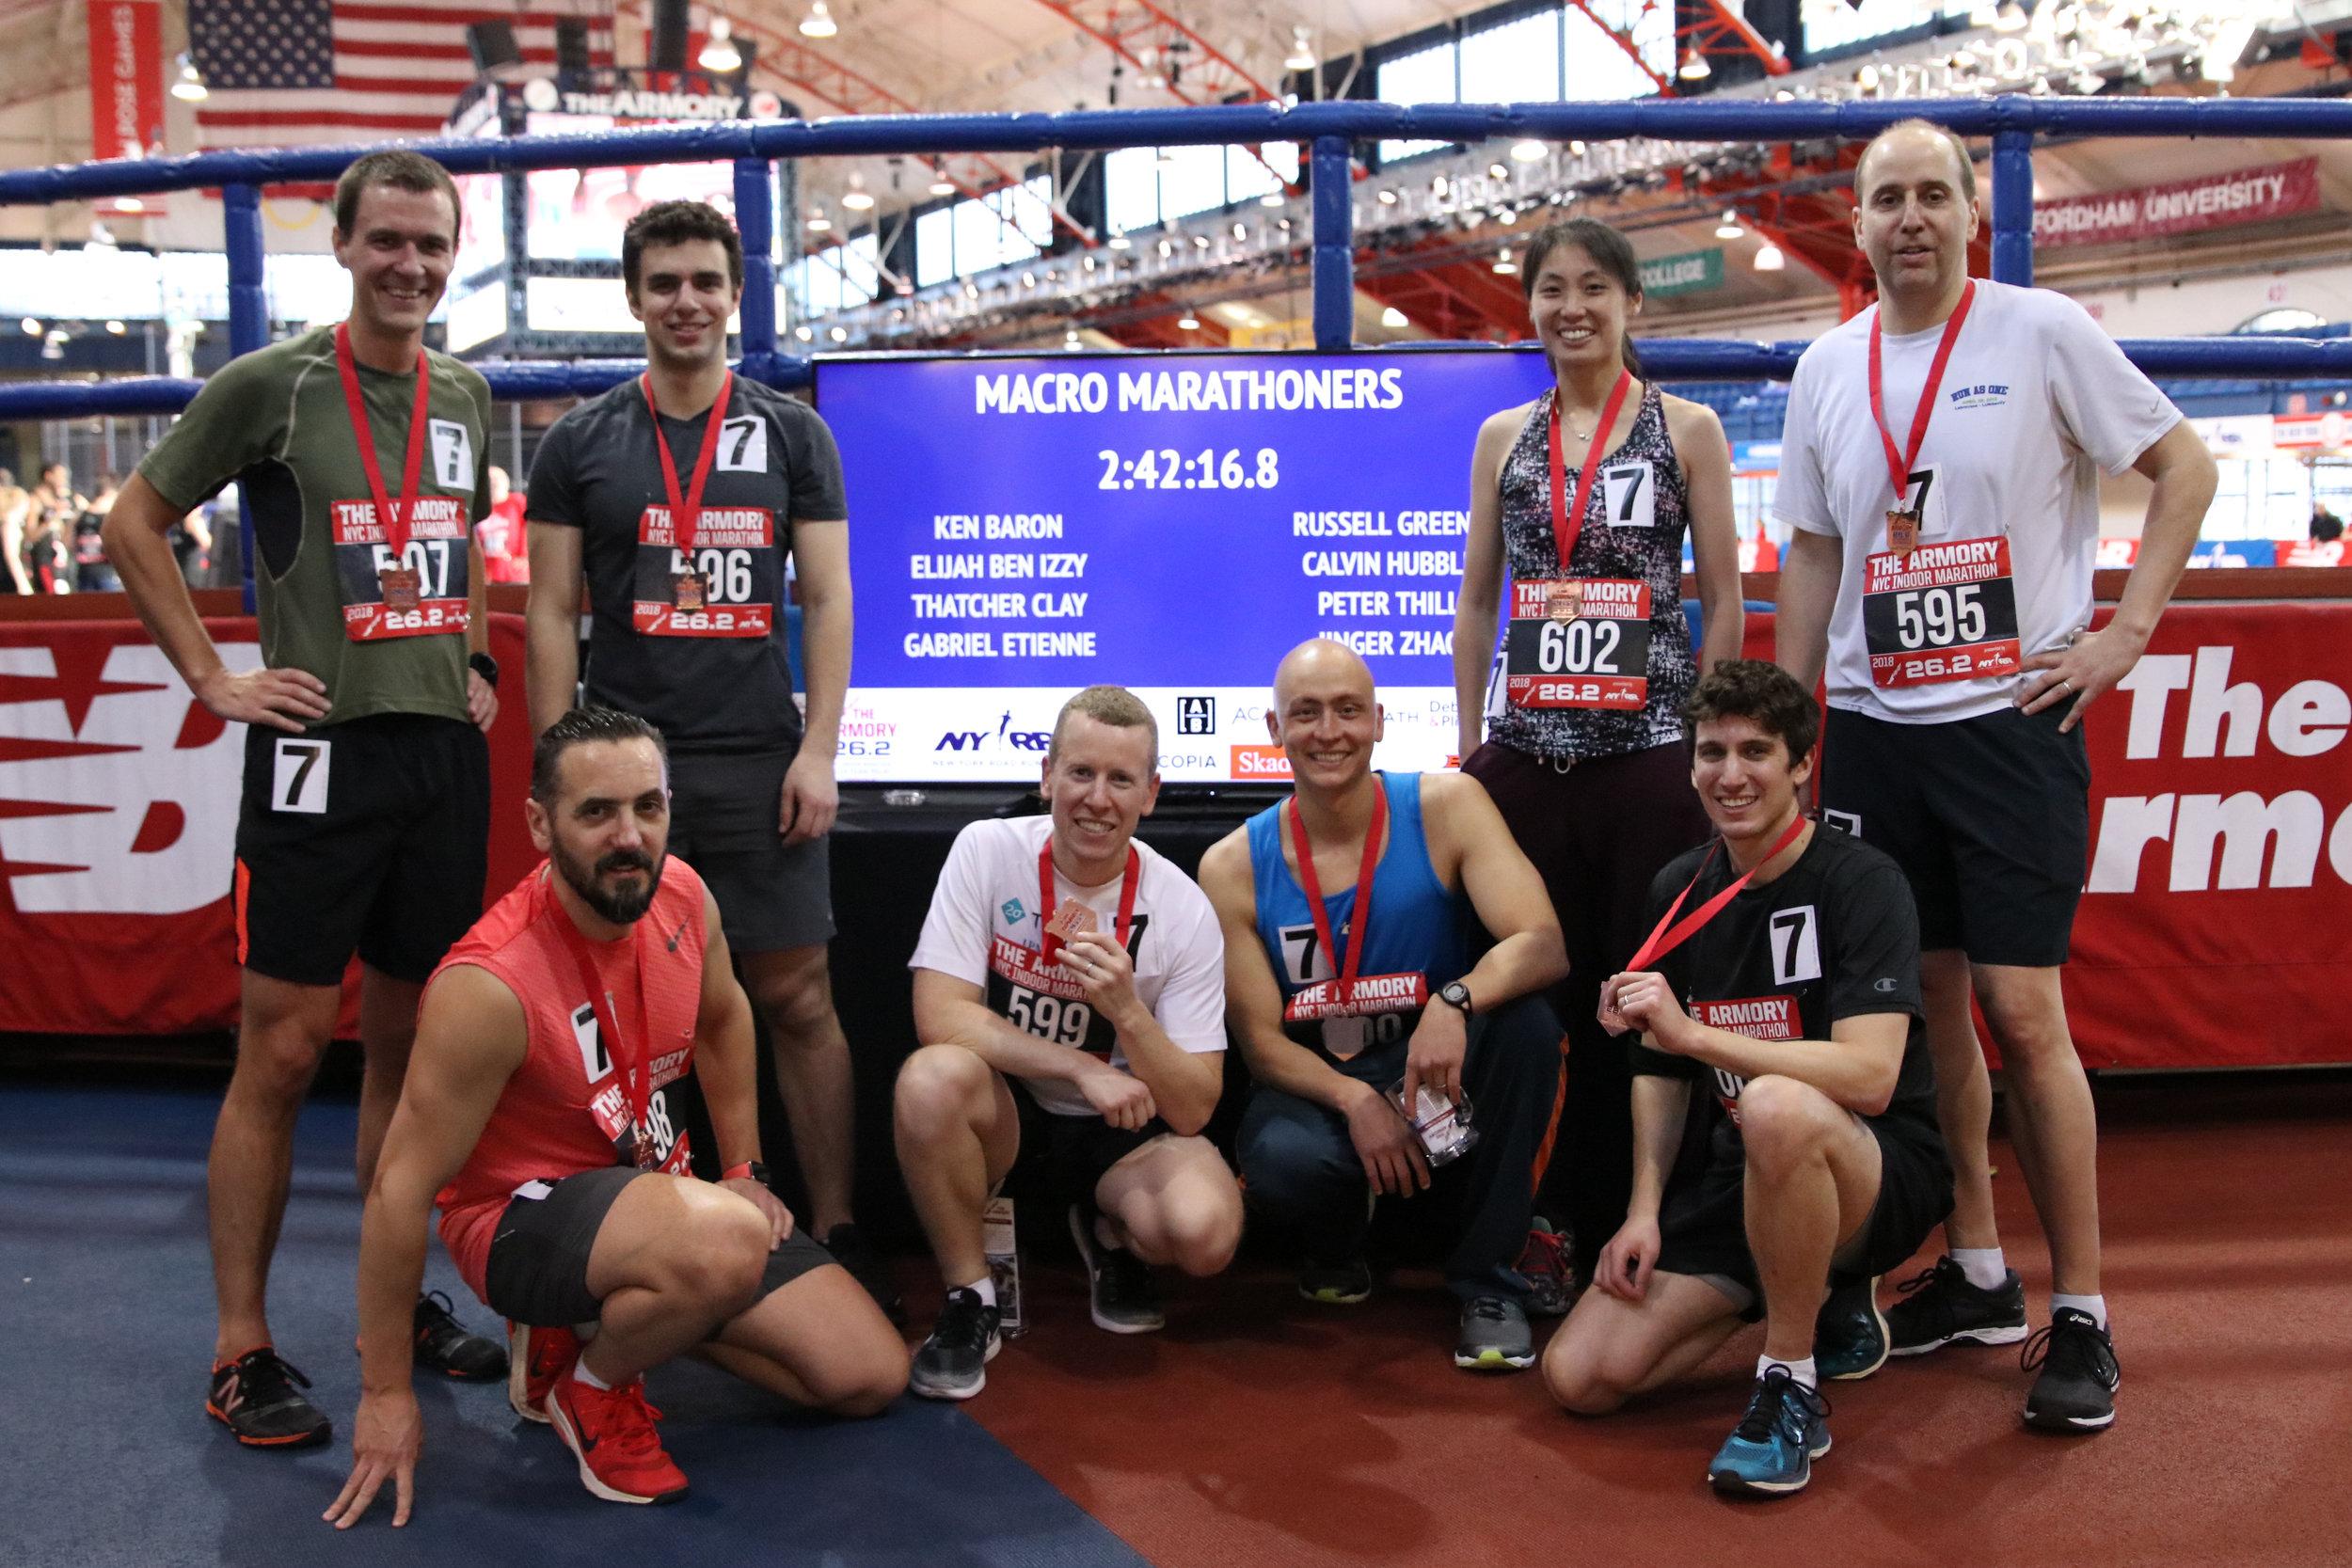 Macro Marathoners (Financial).jpg